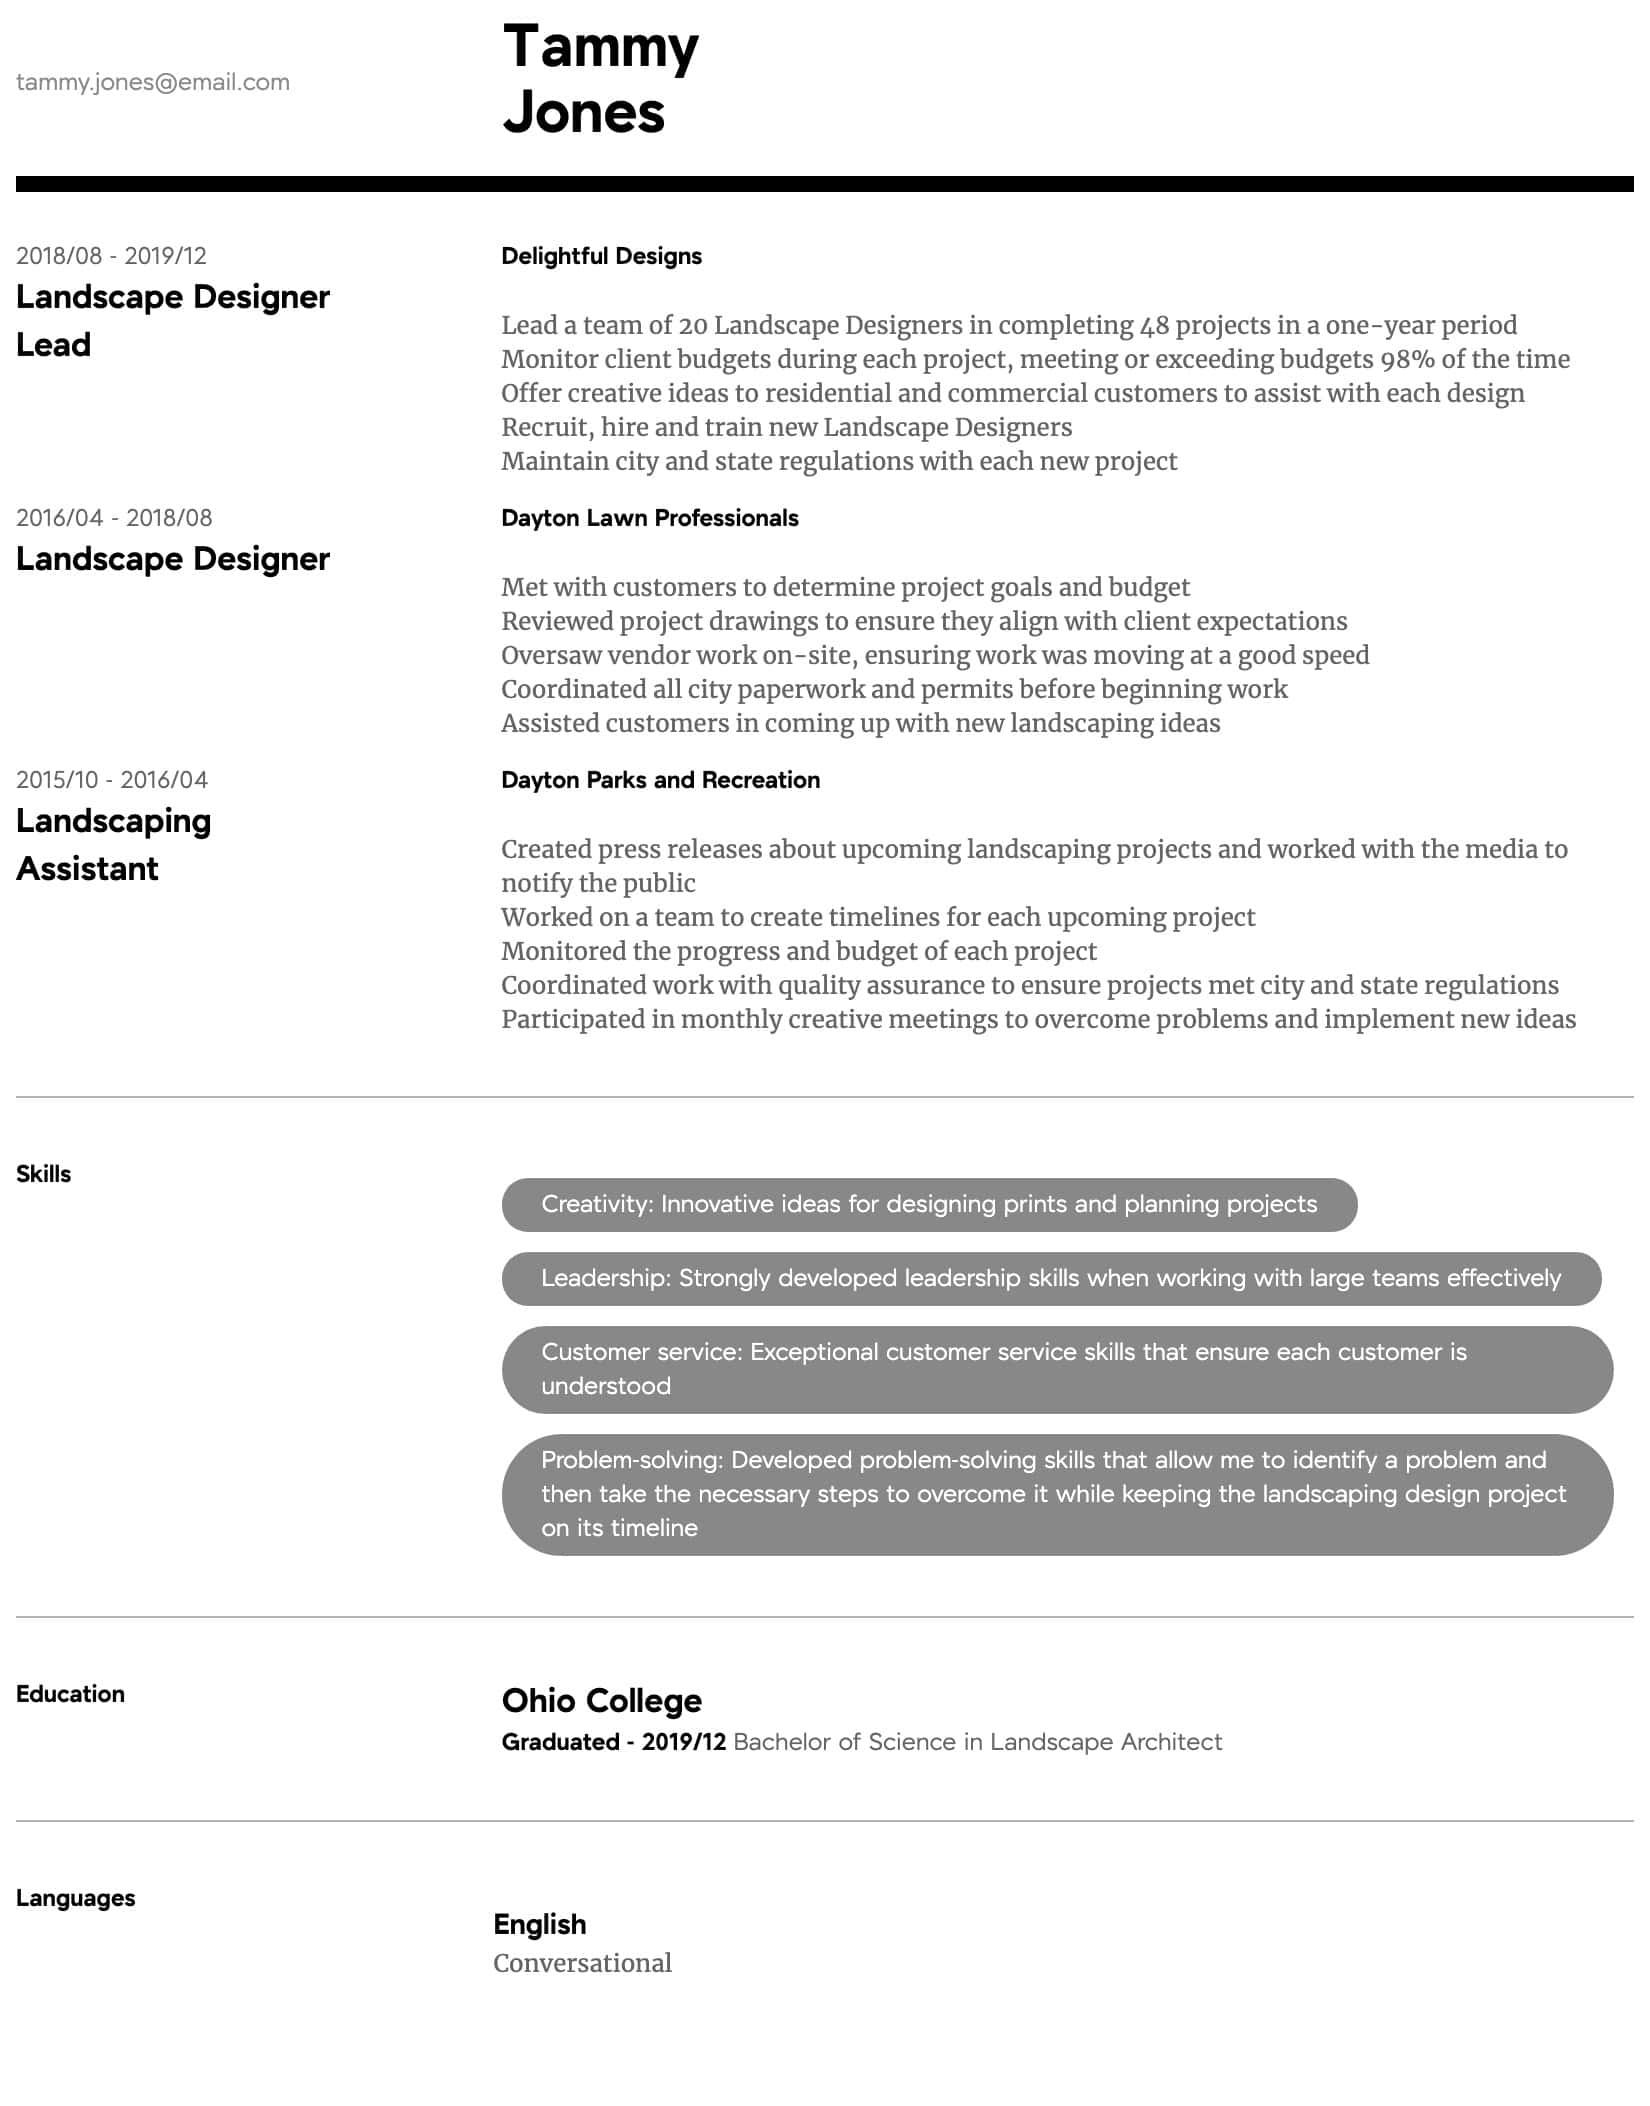 Landscape Designer Resume Samples All Experience Levels Resume Com Resume Com